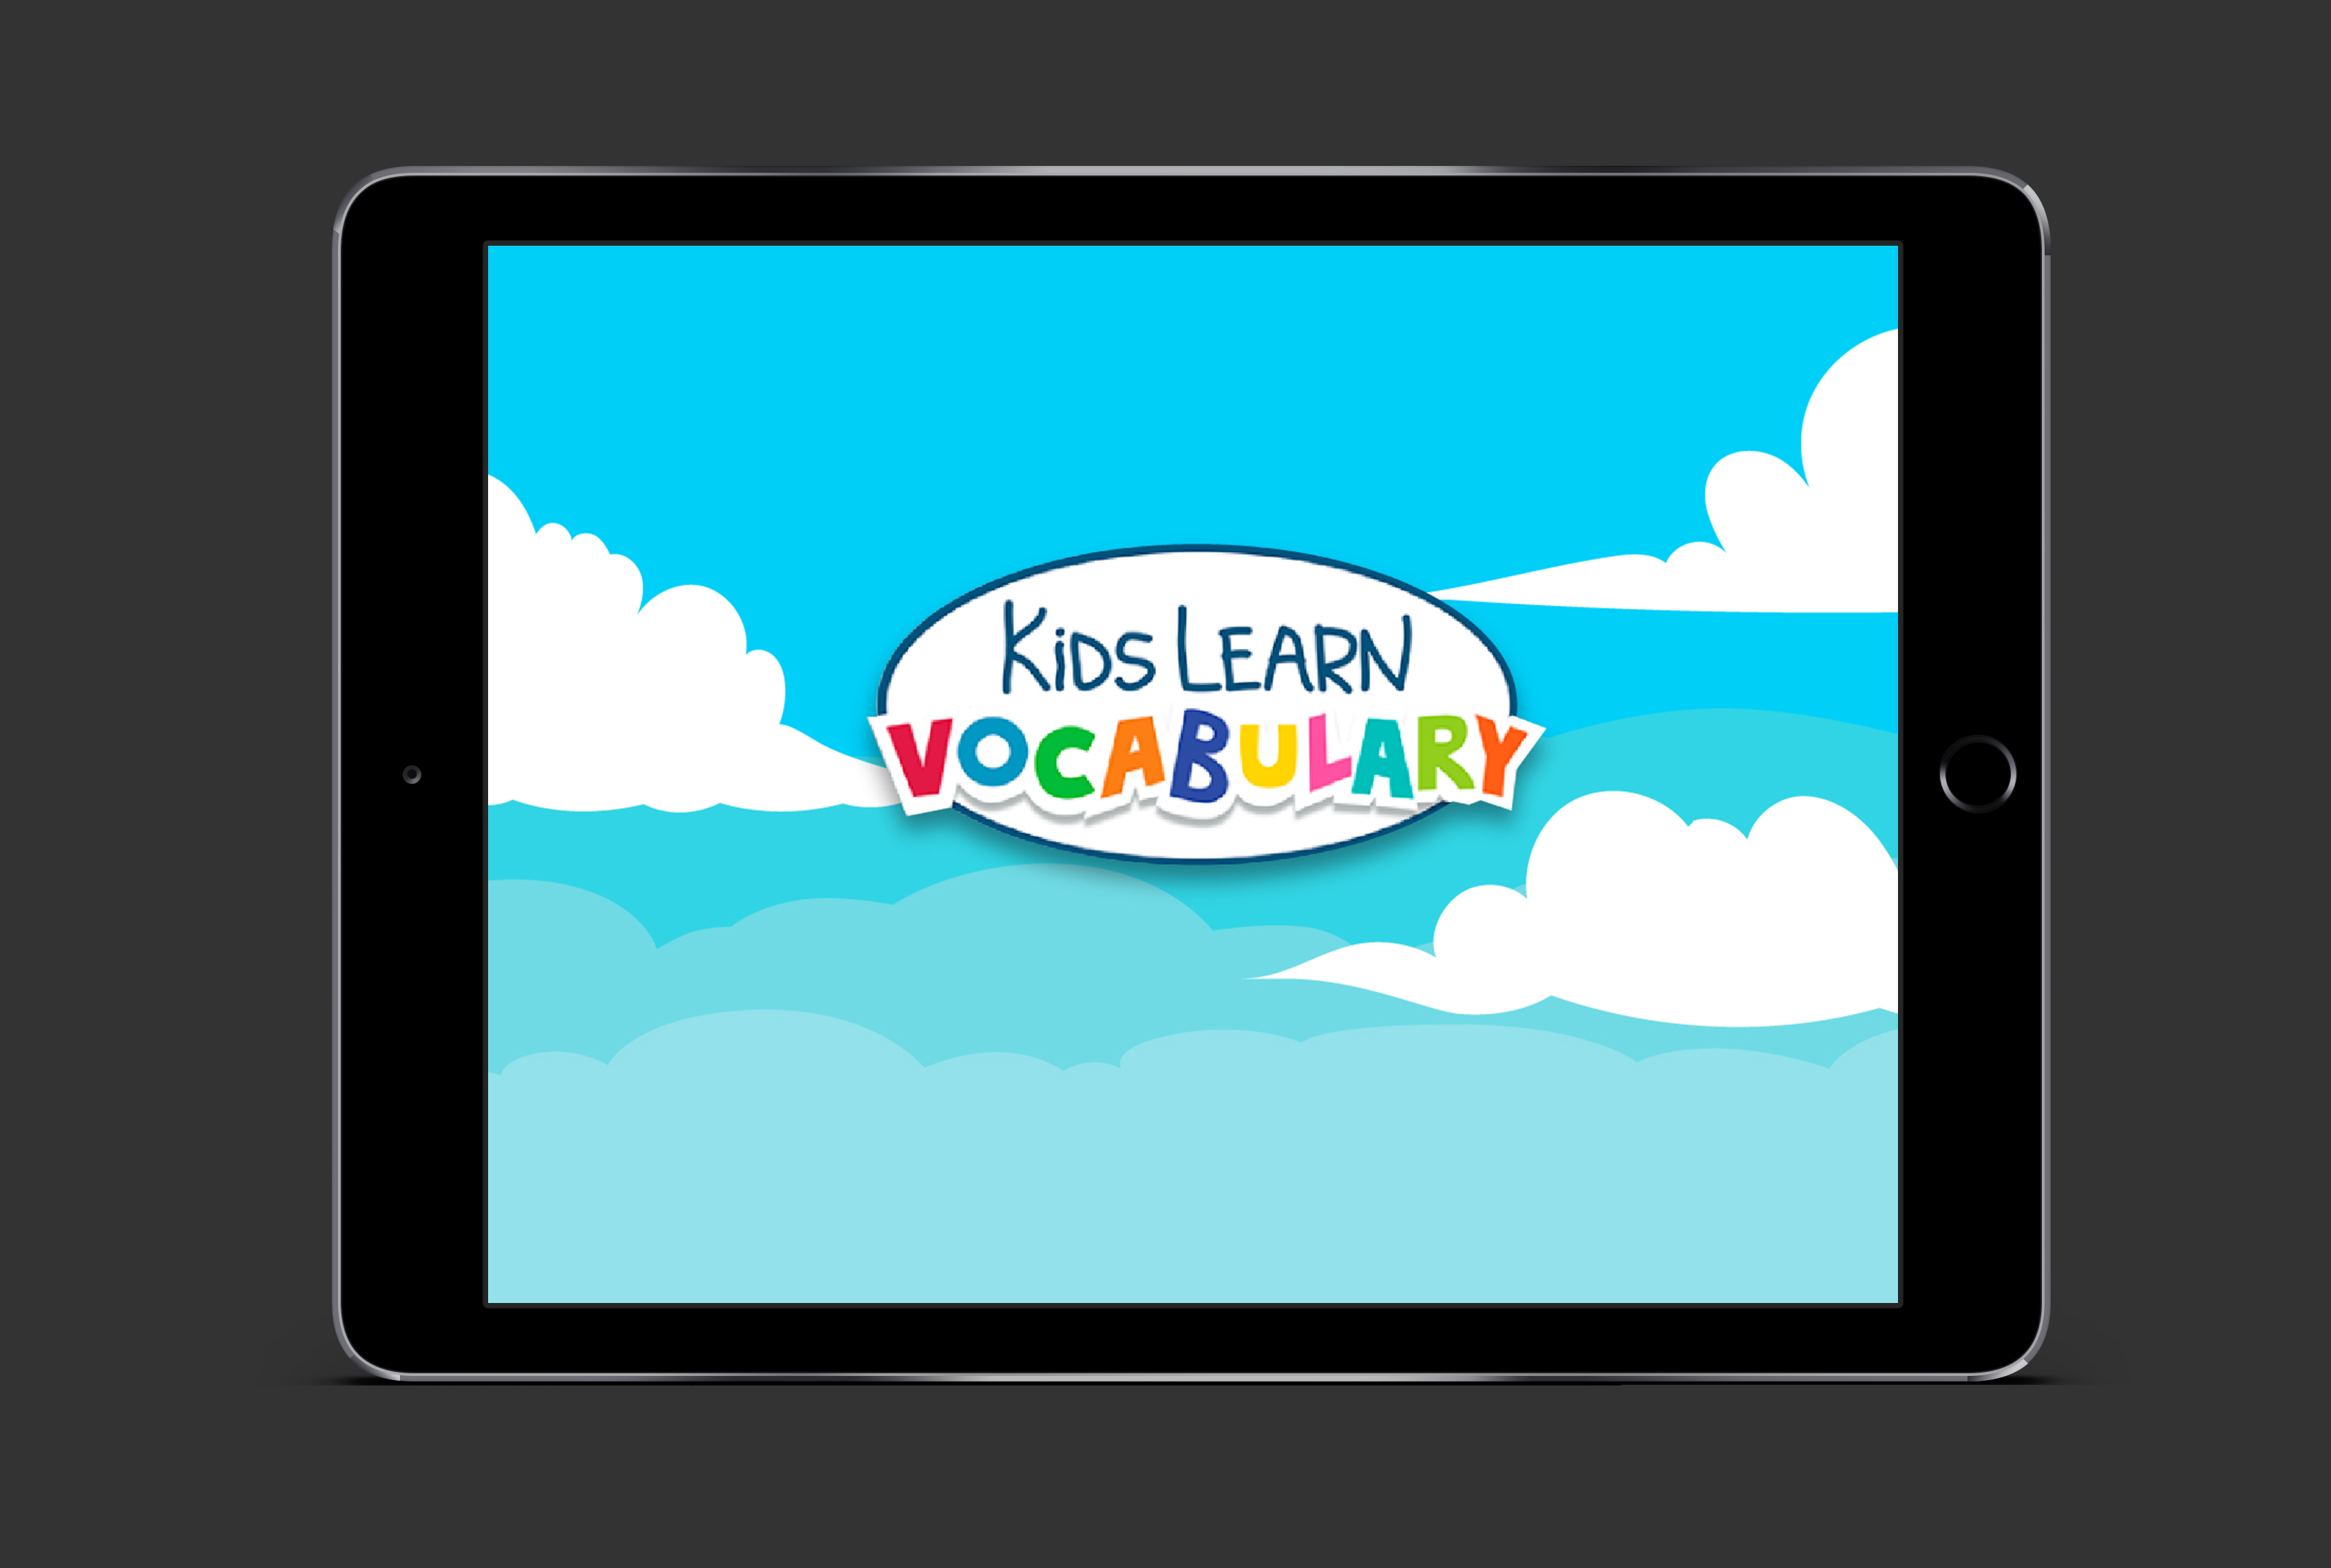 Kids Learn Vocabulary